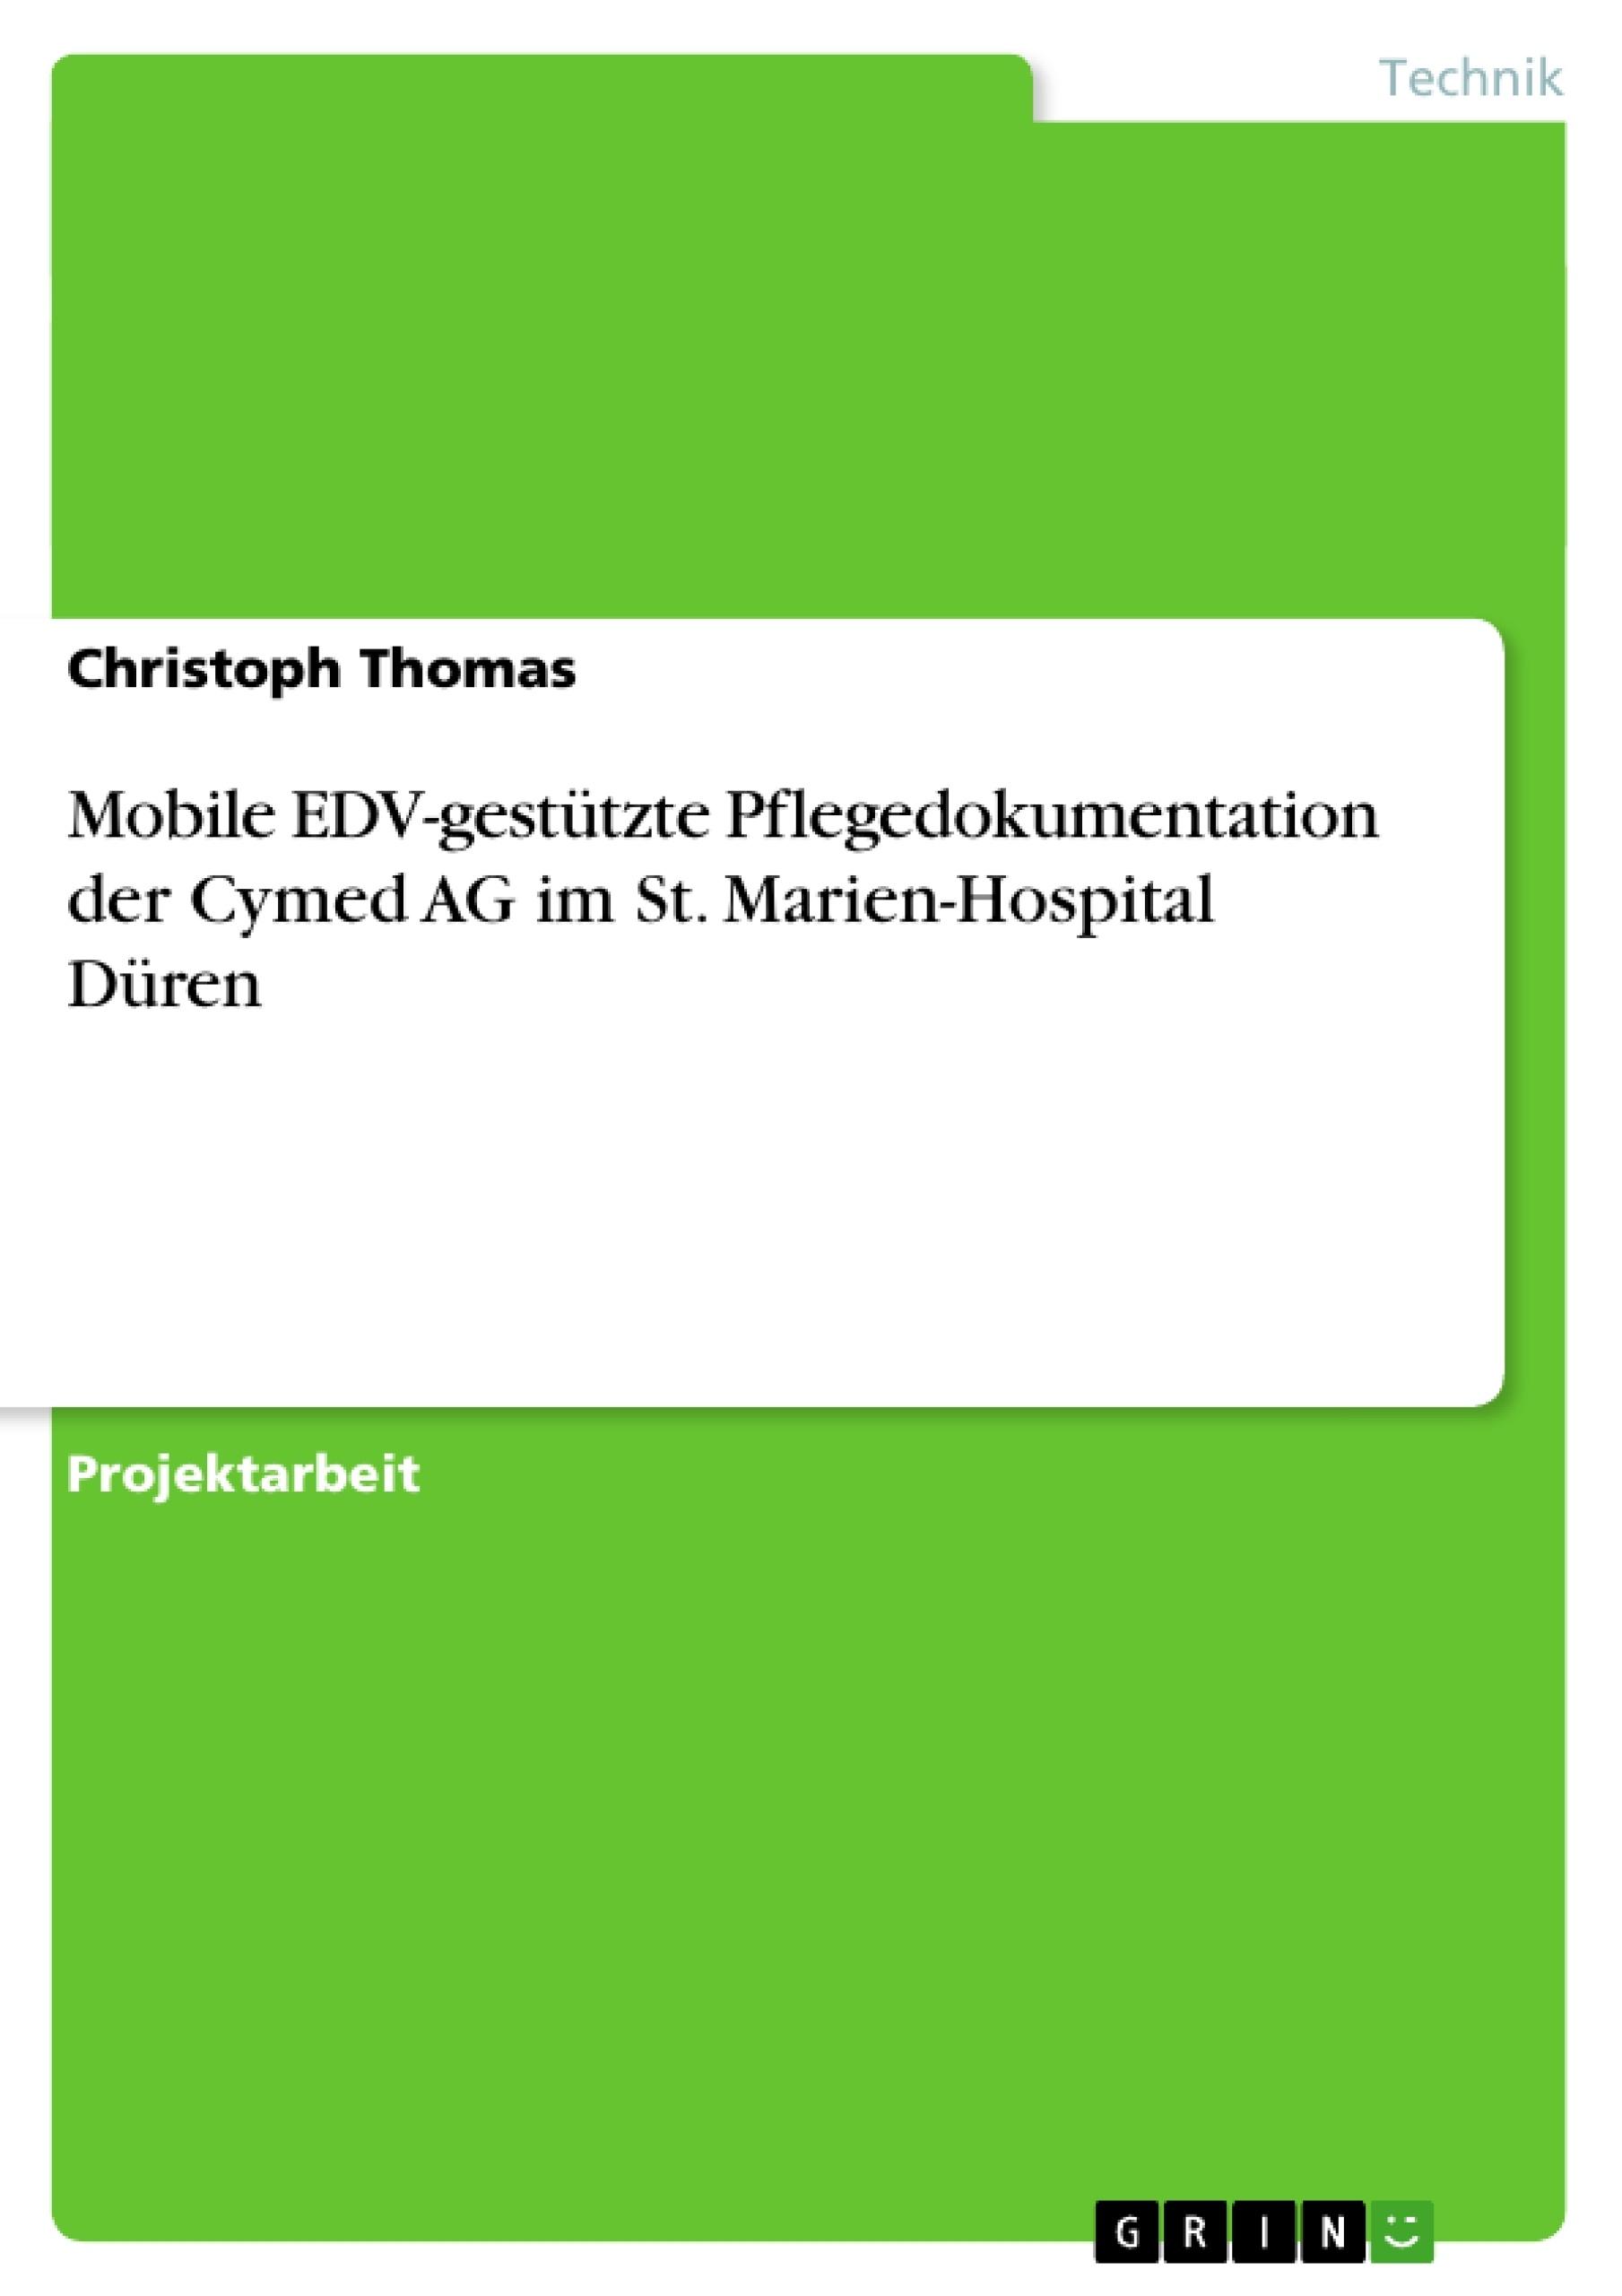 Titel: Mobile EDV-gestützte Pflegedokumentation der Cymed AG im St. Marien-Hospital Düren